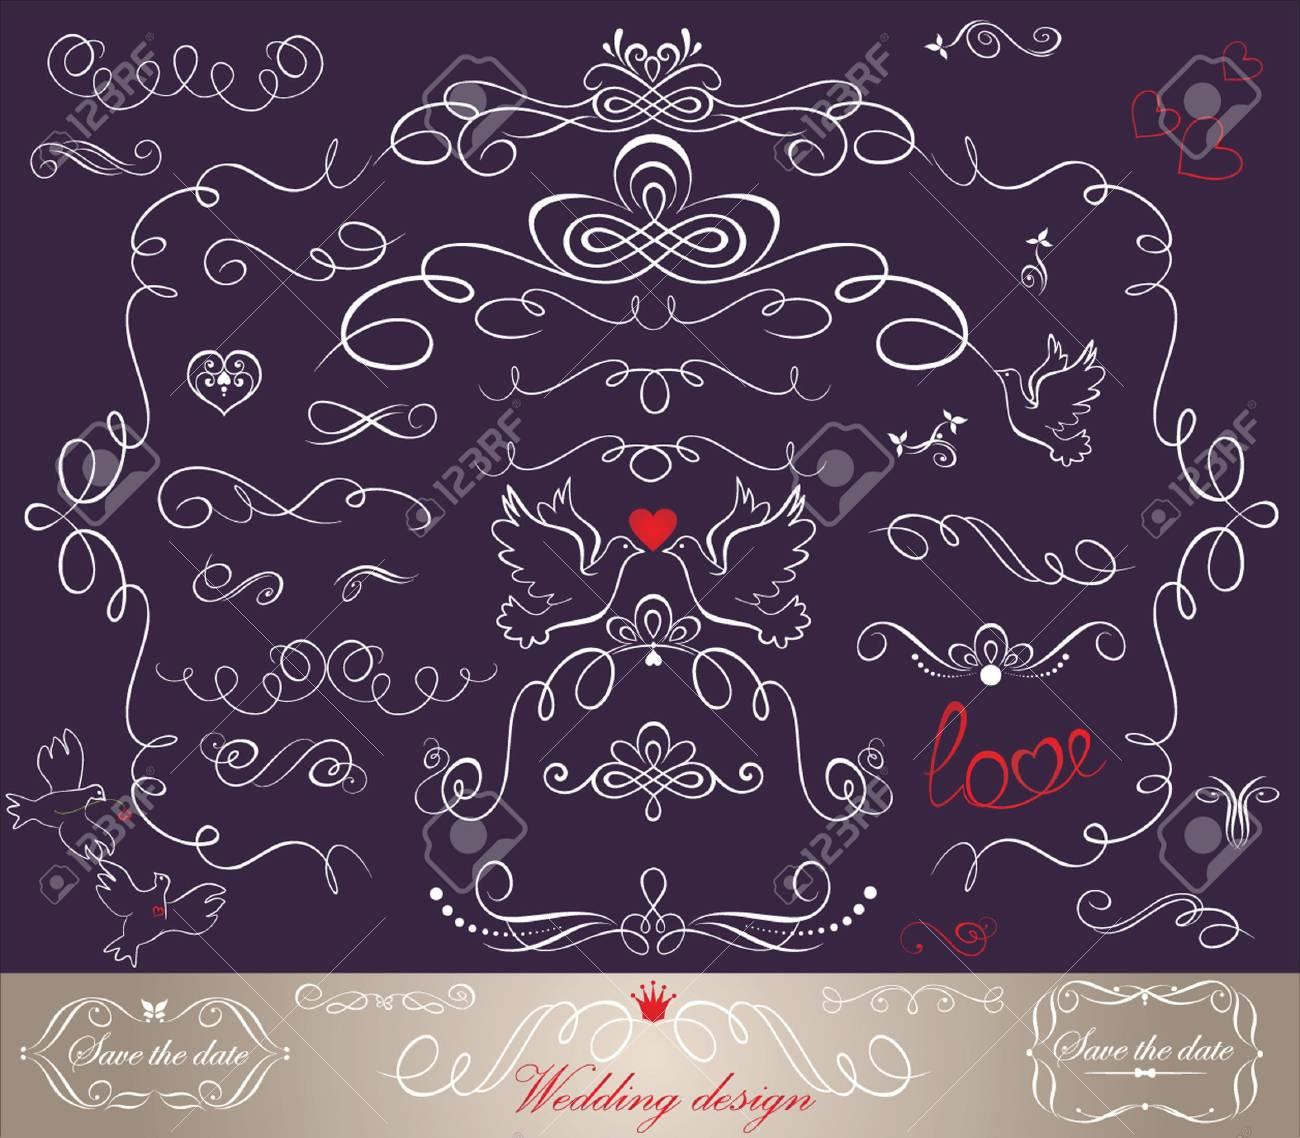 Wedding design Stock Vector - 18894032